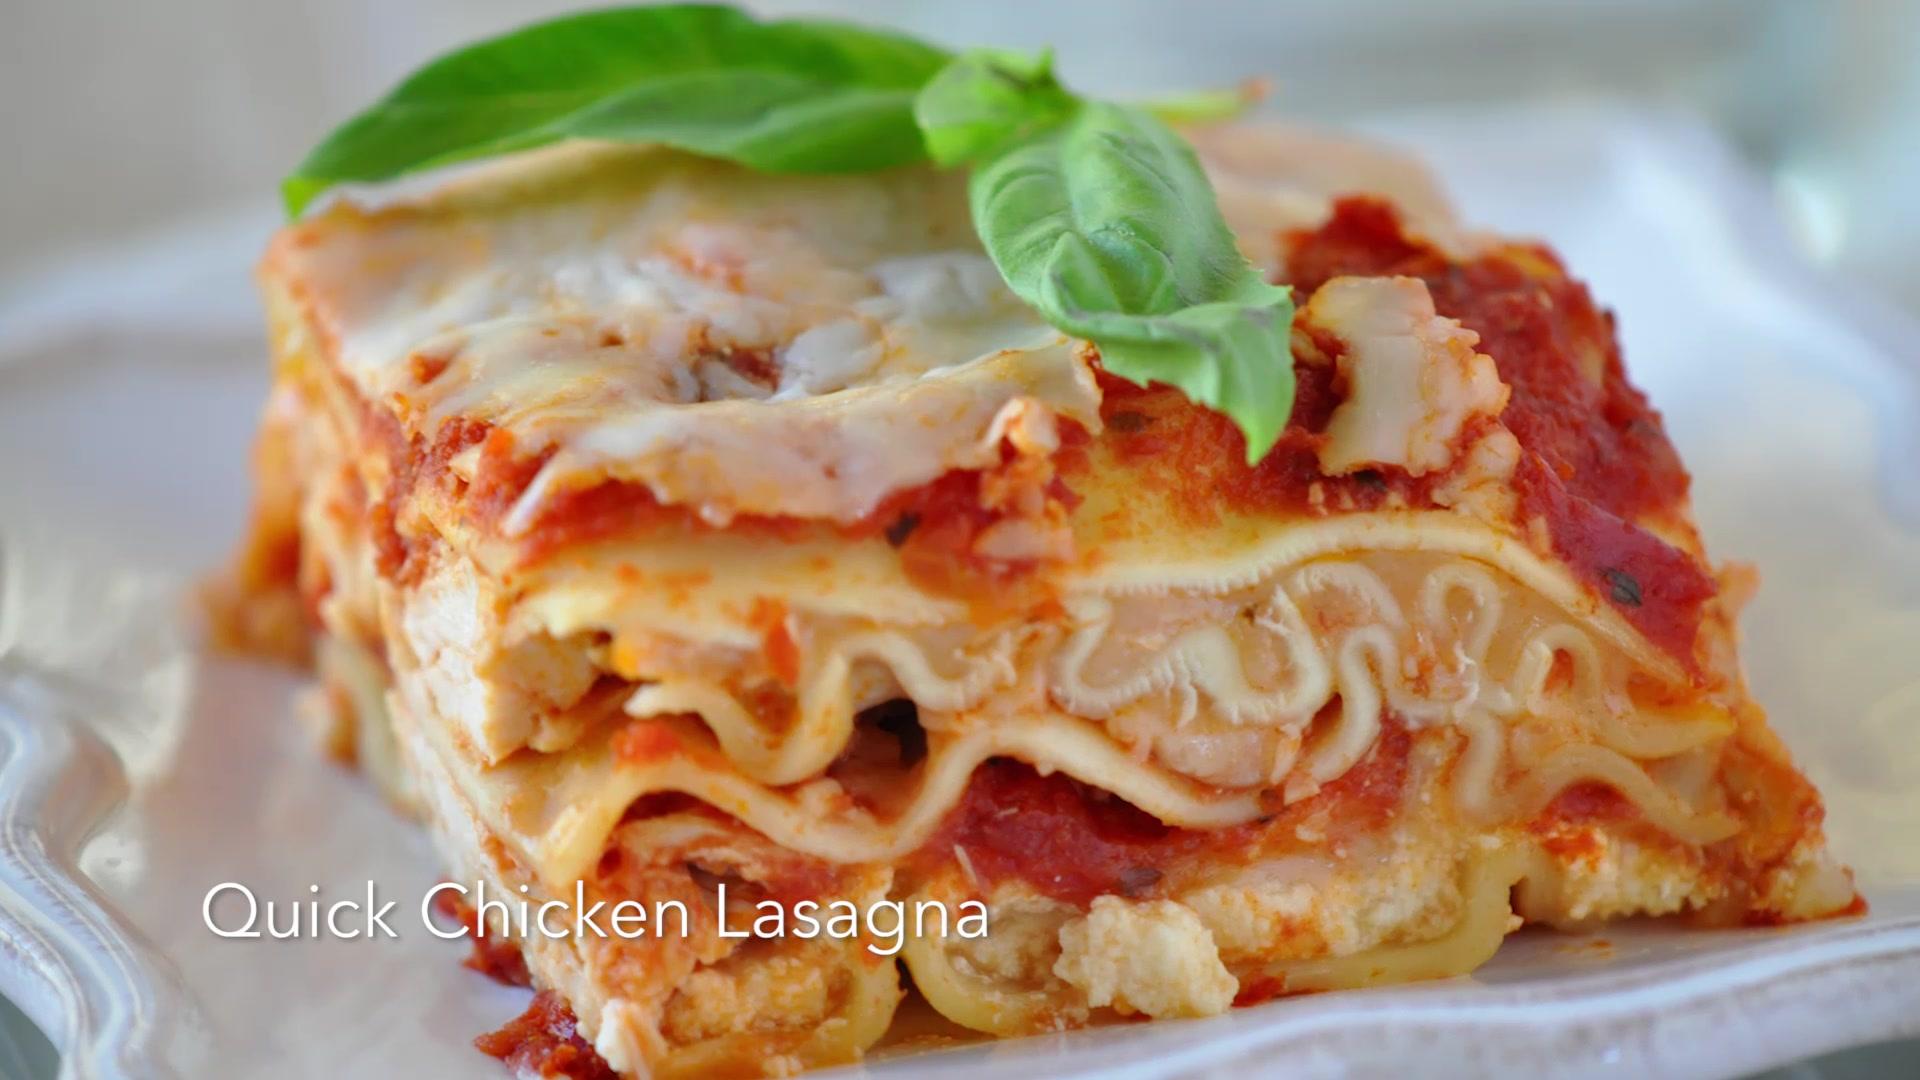 How to Make Quick Chicken Lasagna